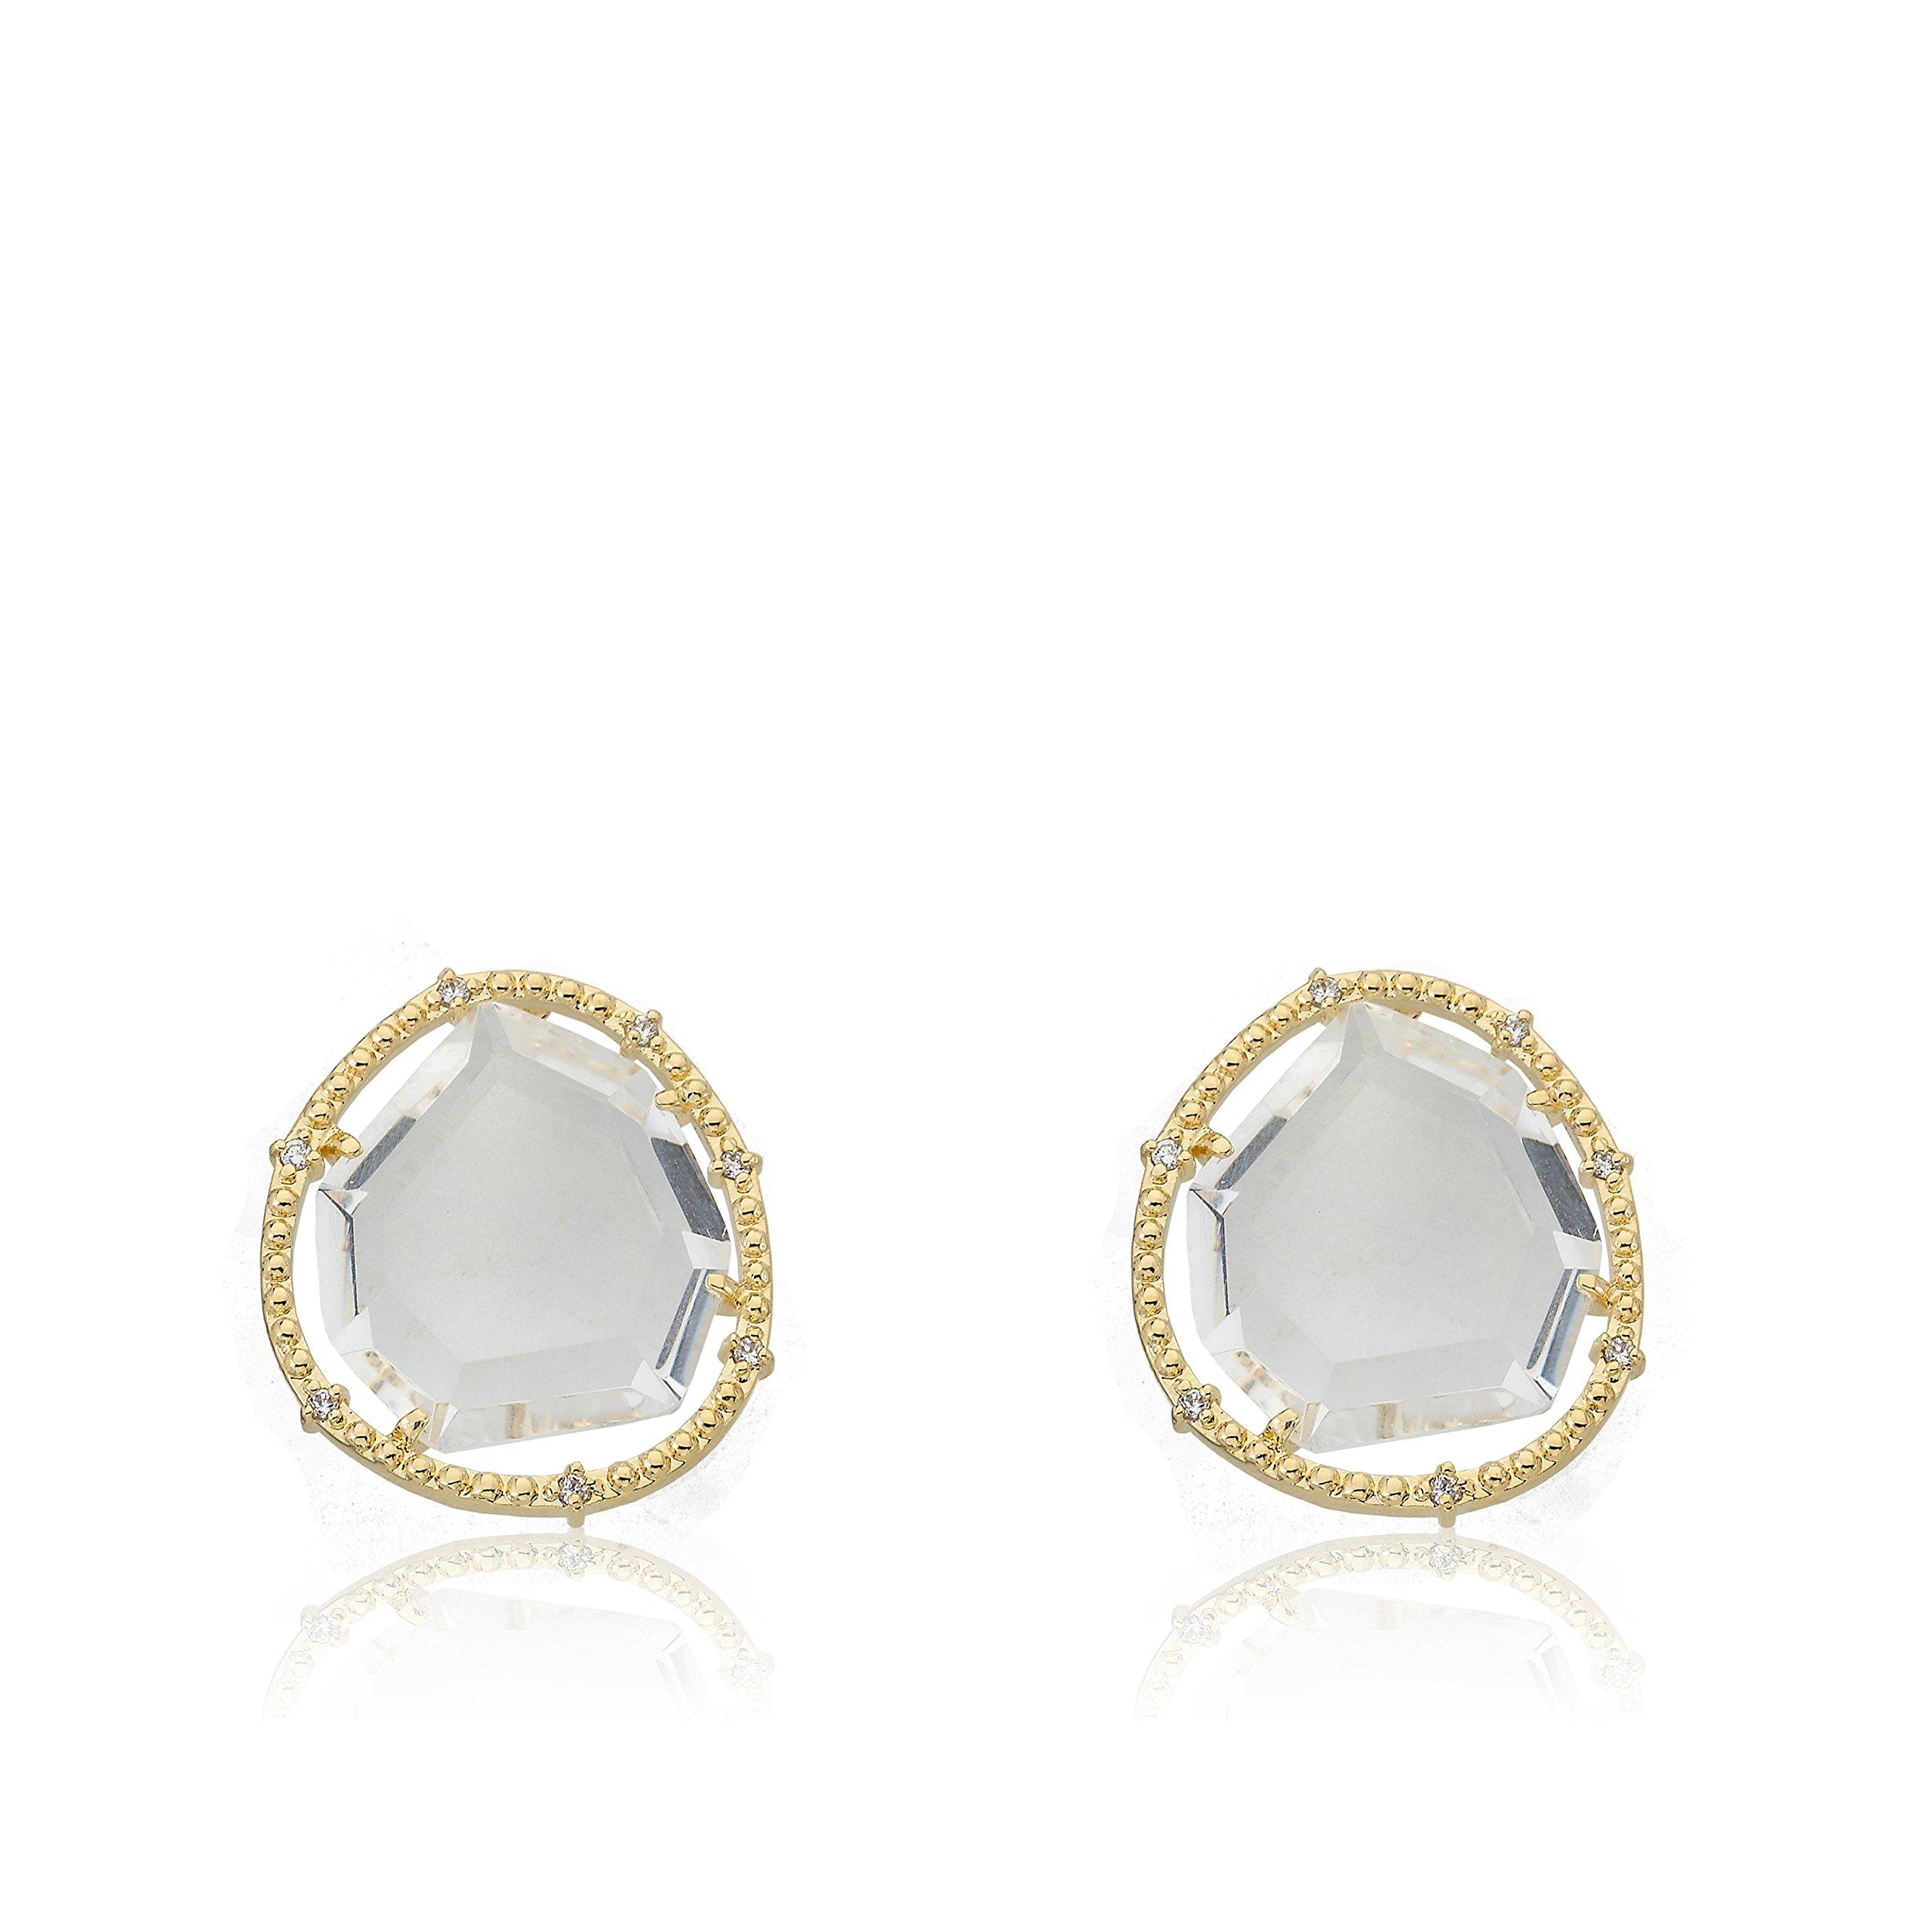 Riccova Sliced Glass 14k Gold-Plated Clear Sliced Glass Stud Earring by Riccova